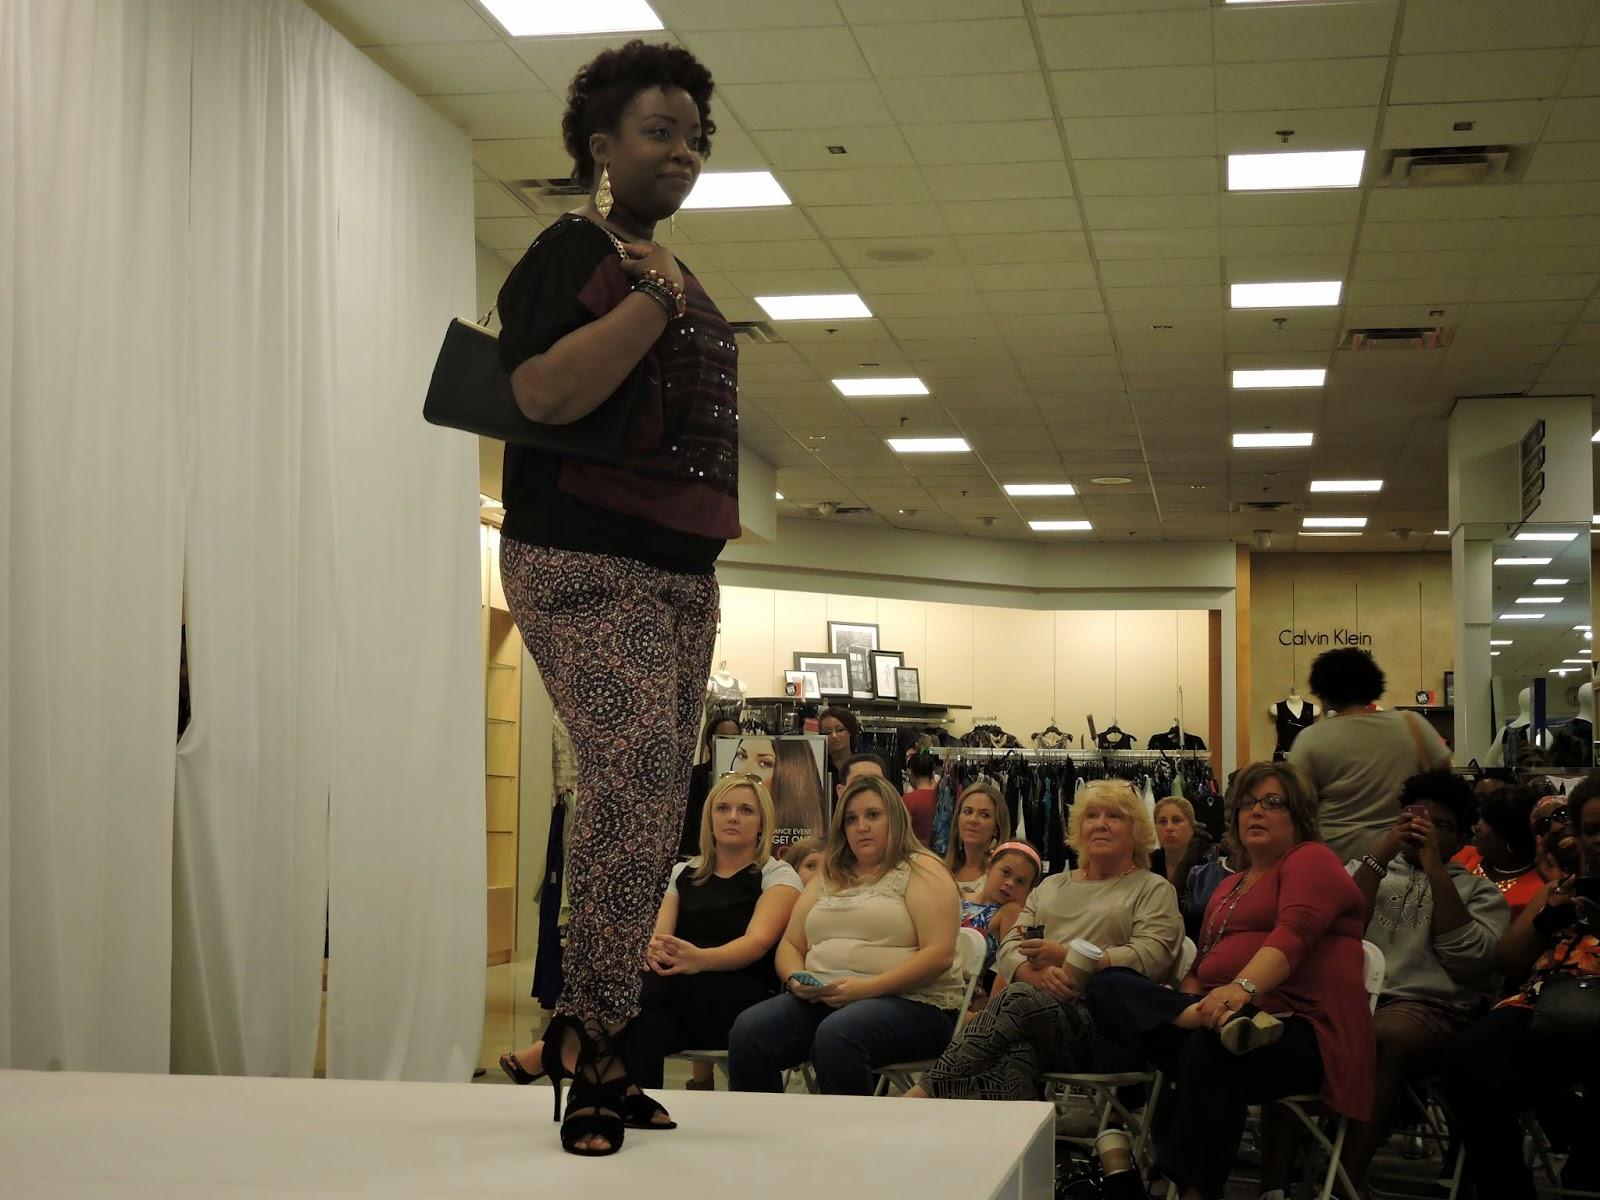 Macy's Fall Fashion Show Event with Emme Recap #MacysEvents @SheSpeaksUp @Macys via www.Productreviewmom.com